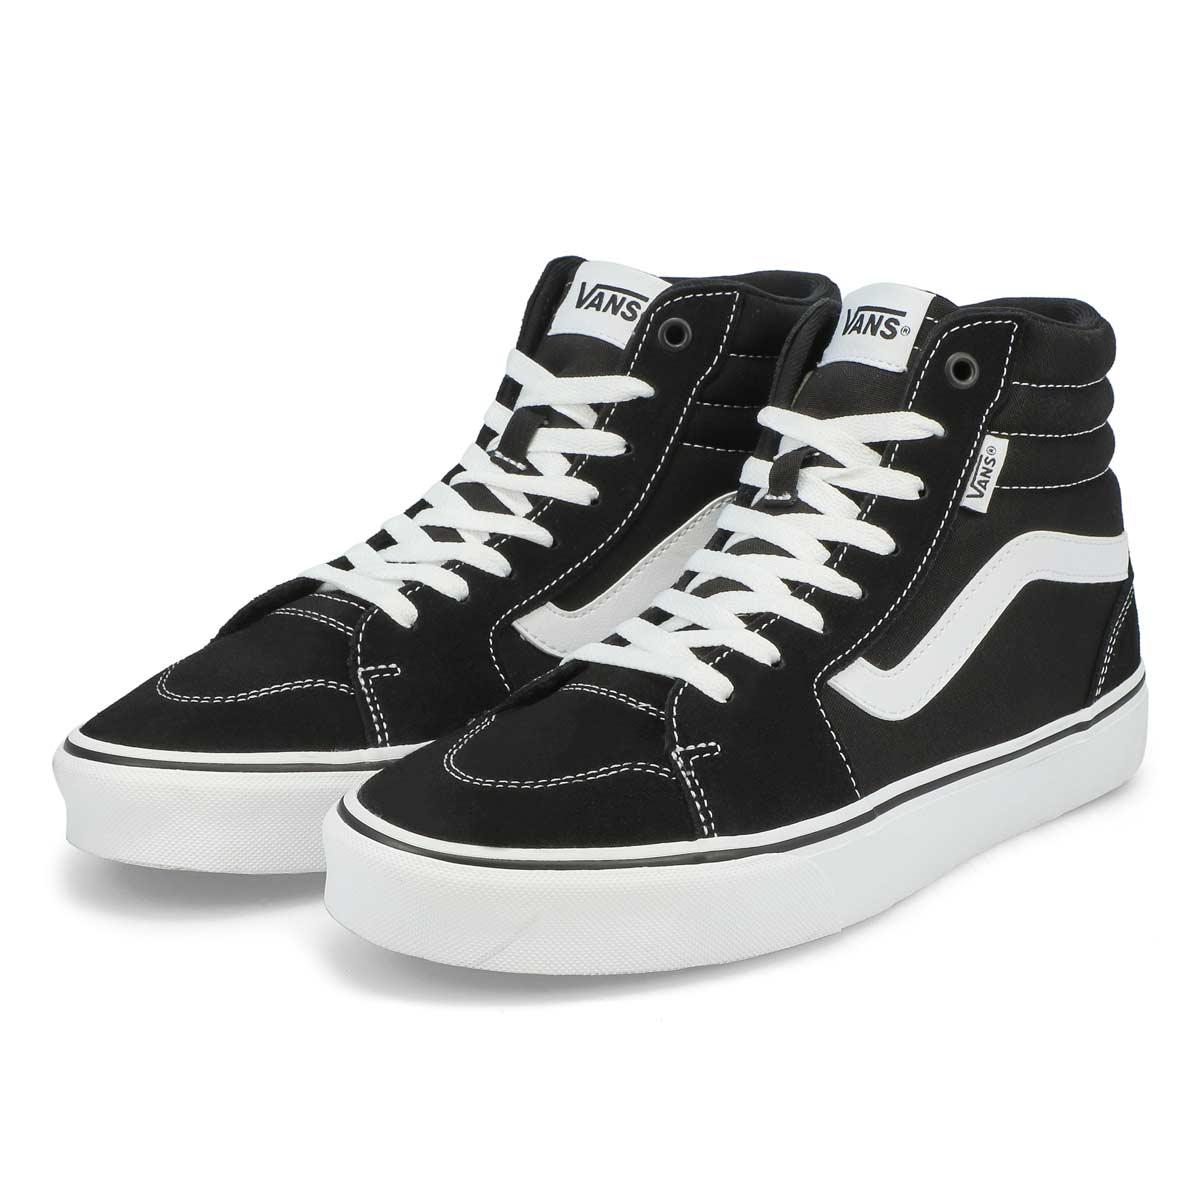 Men's Filmore Hi Top Sneaker - Black/White